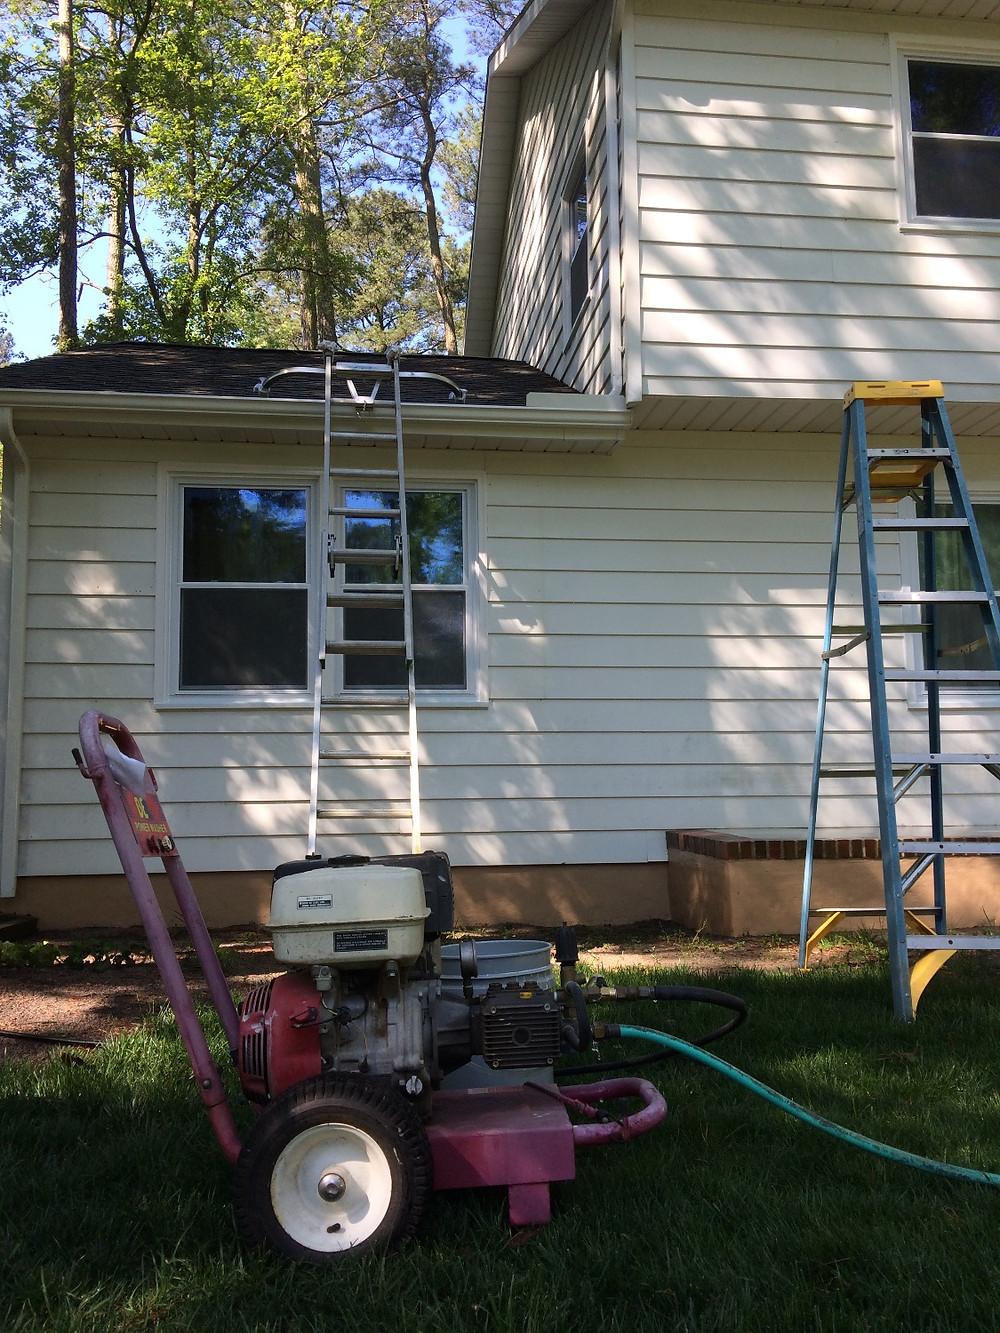 Low pressure wash prior to painting aluminum siding.